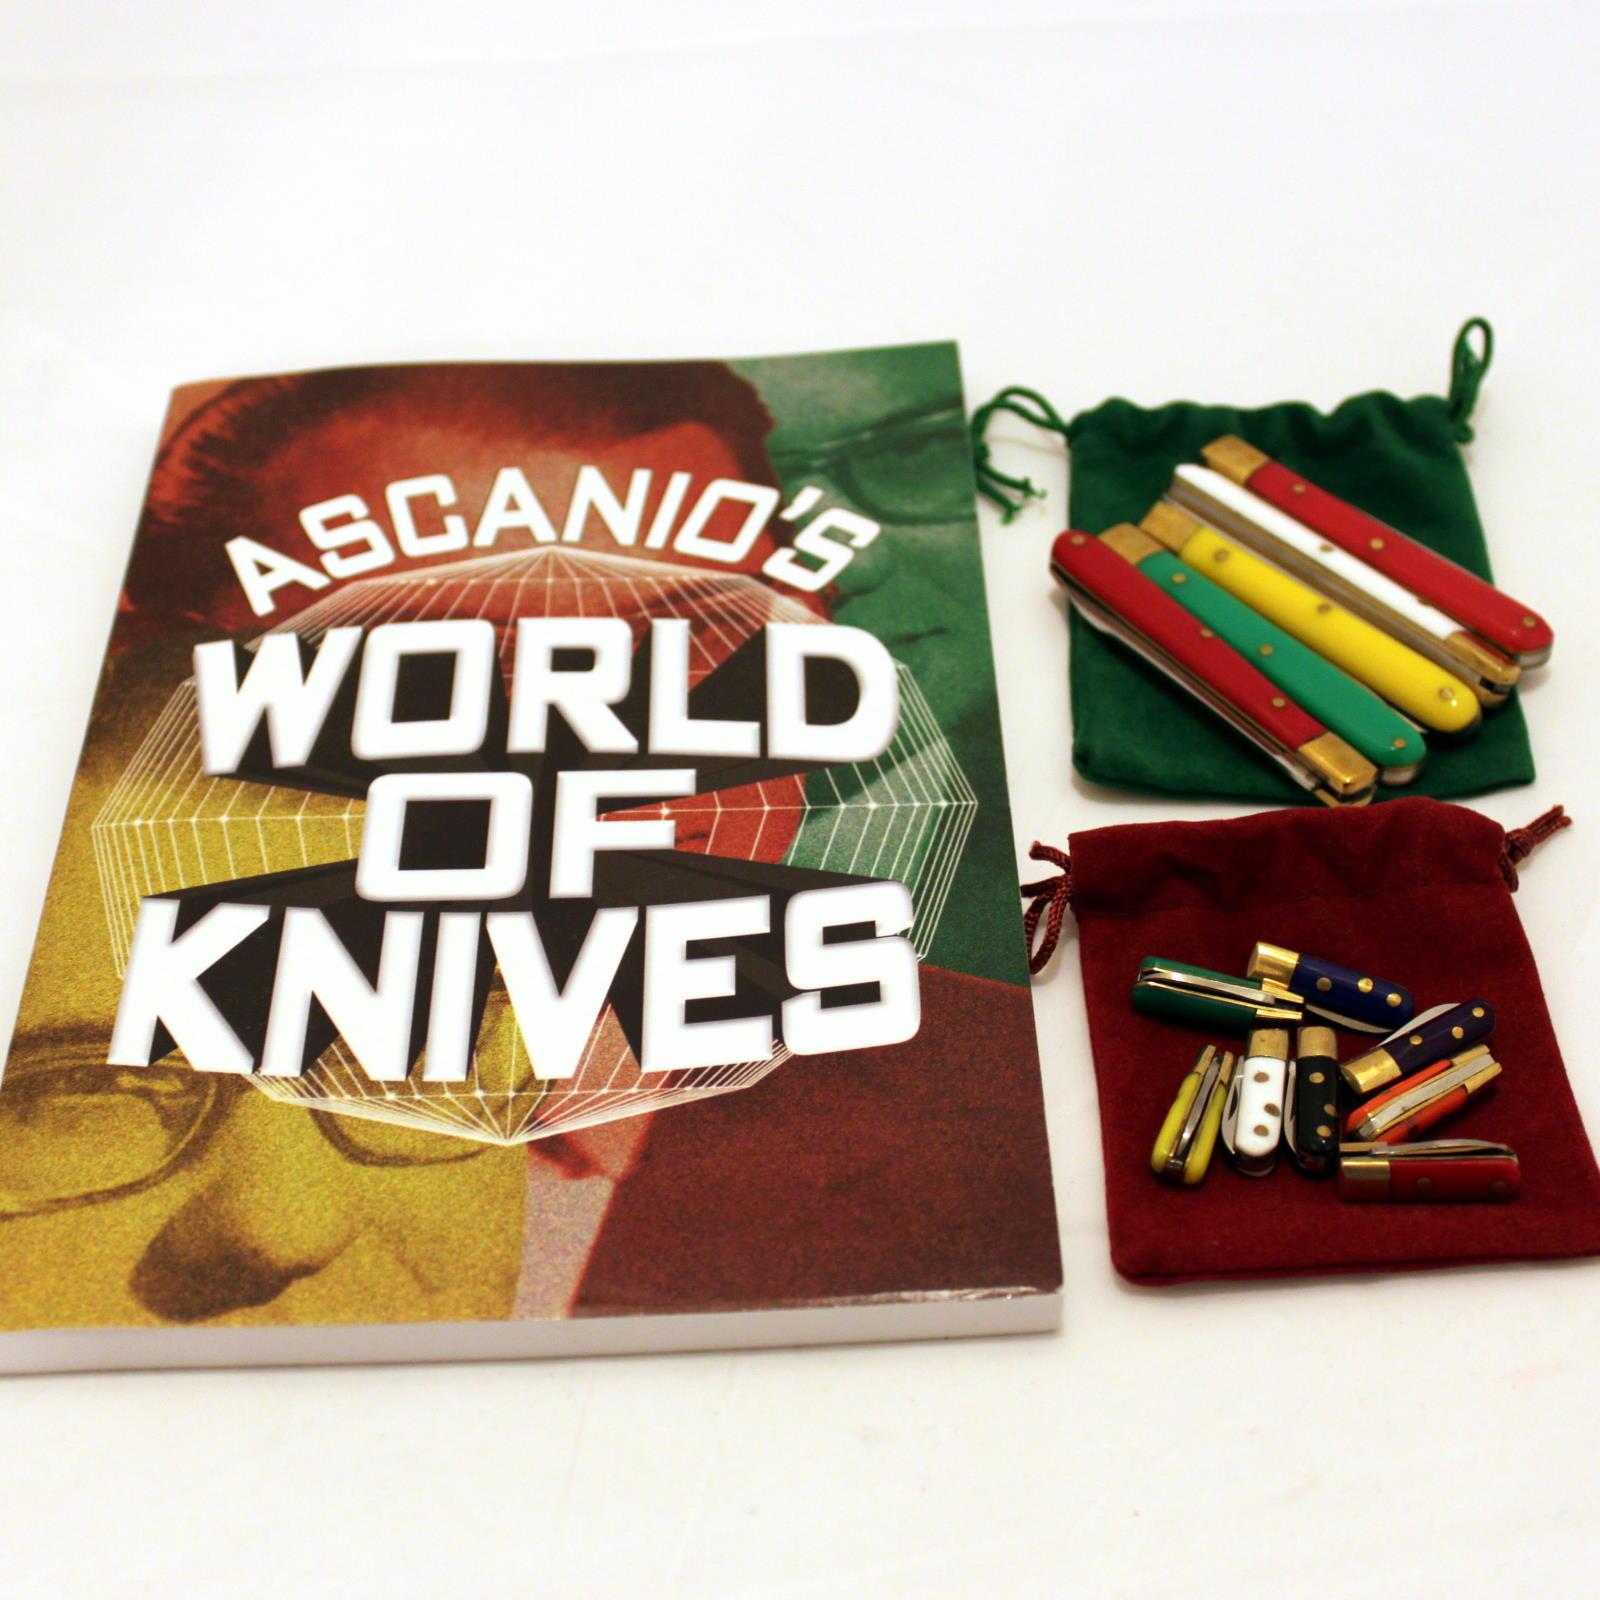 Ascanio World of Knives + Knives by Joe Mogar, Ascanio